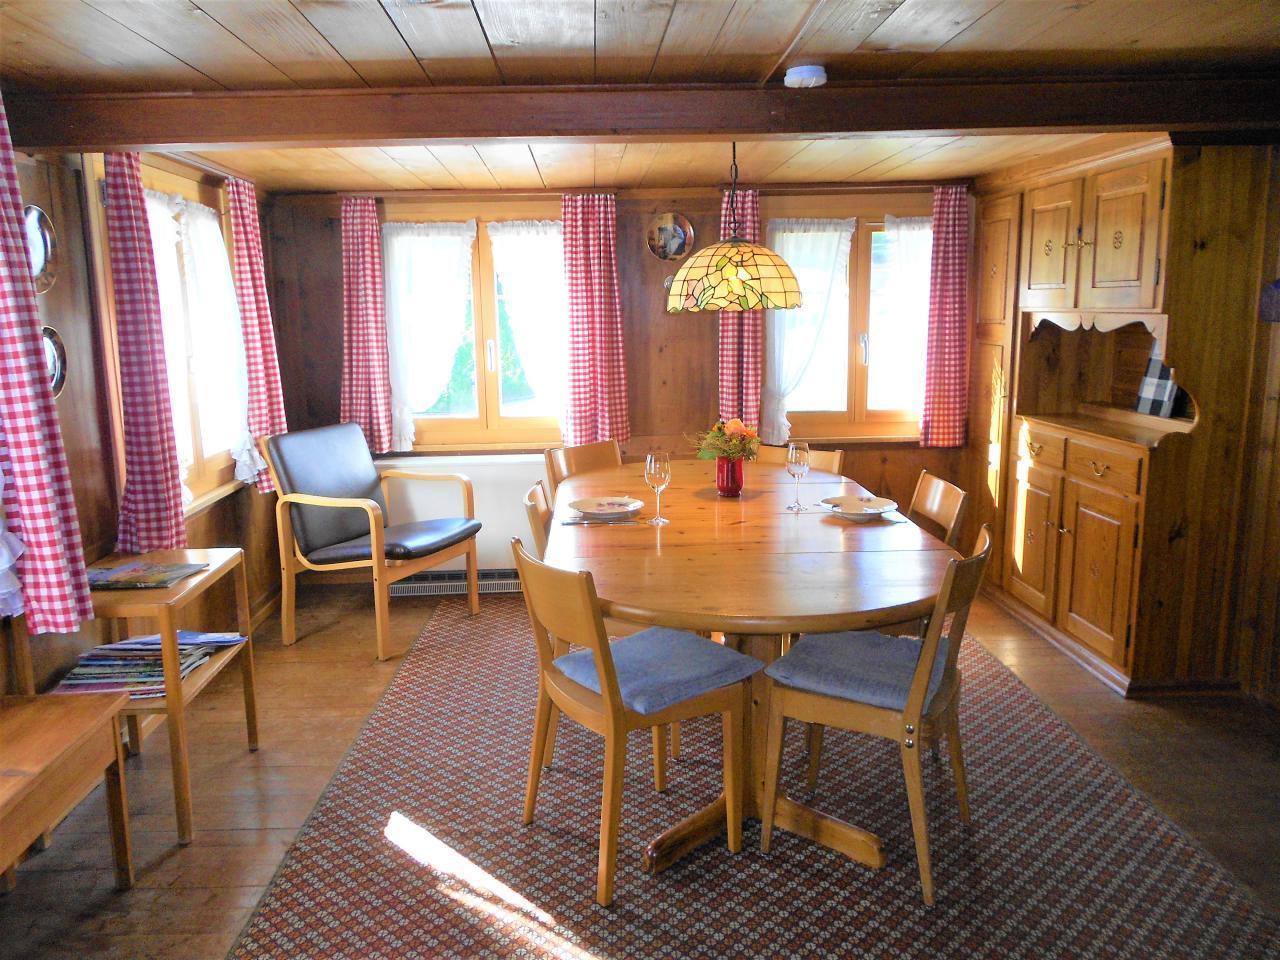 Maison de vacances Alpenrösli in Nesslau (2640830), Nesslau, Toggenbourg, Suisse Orientale, Suisse, image 3